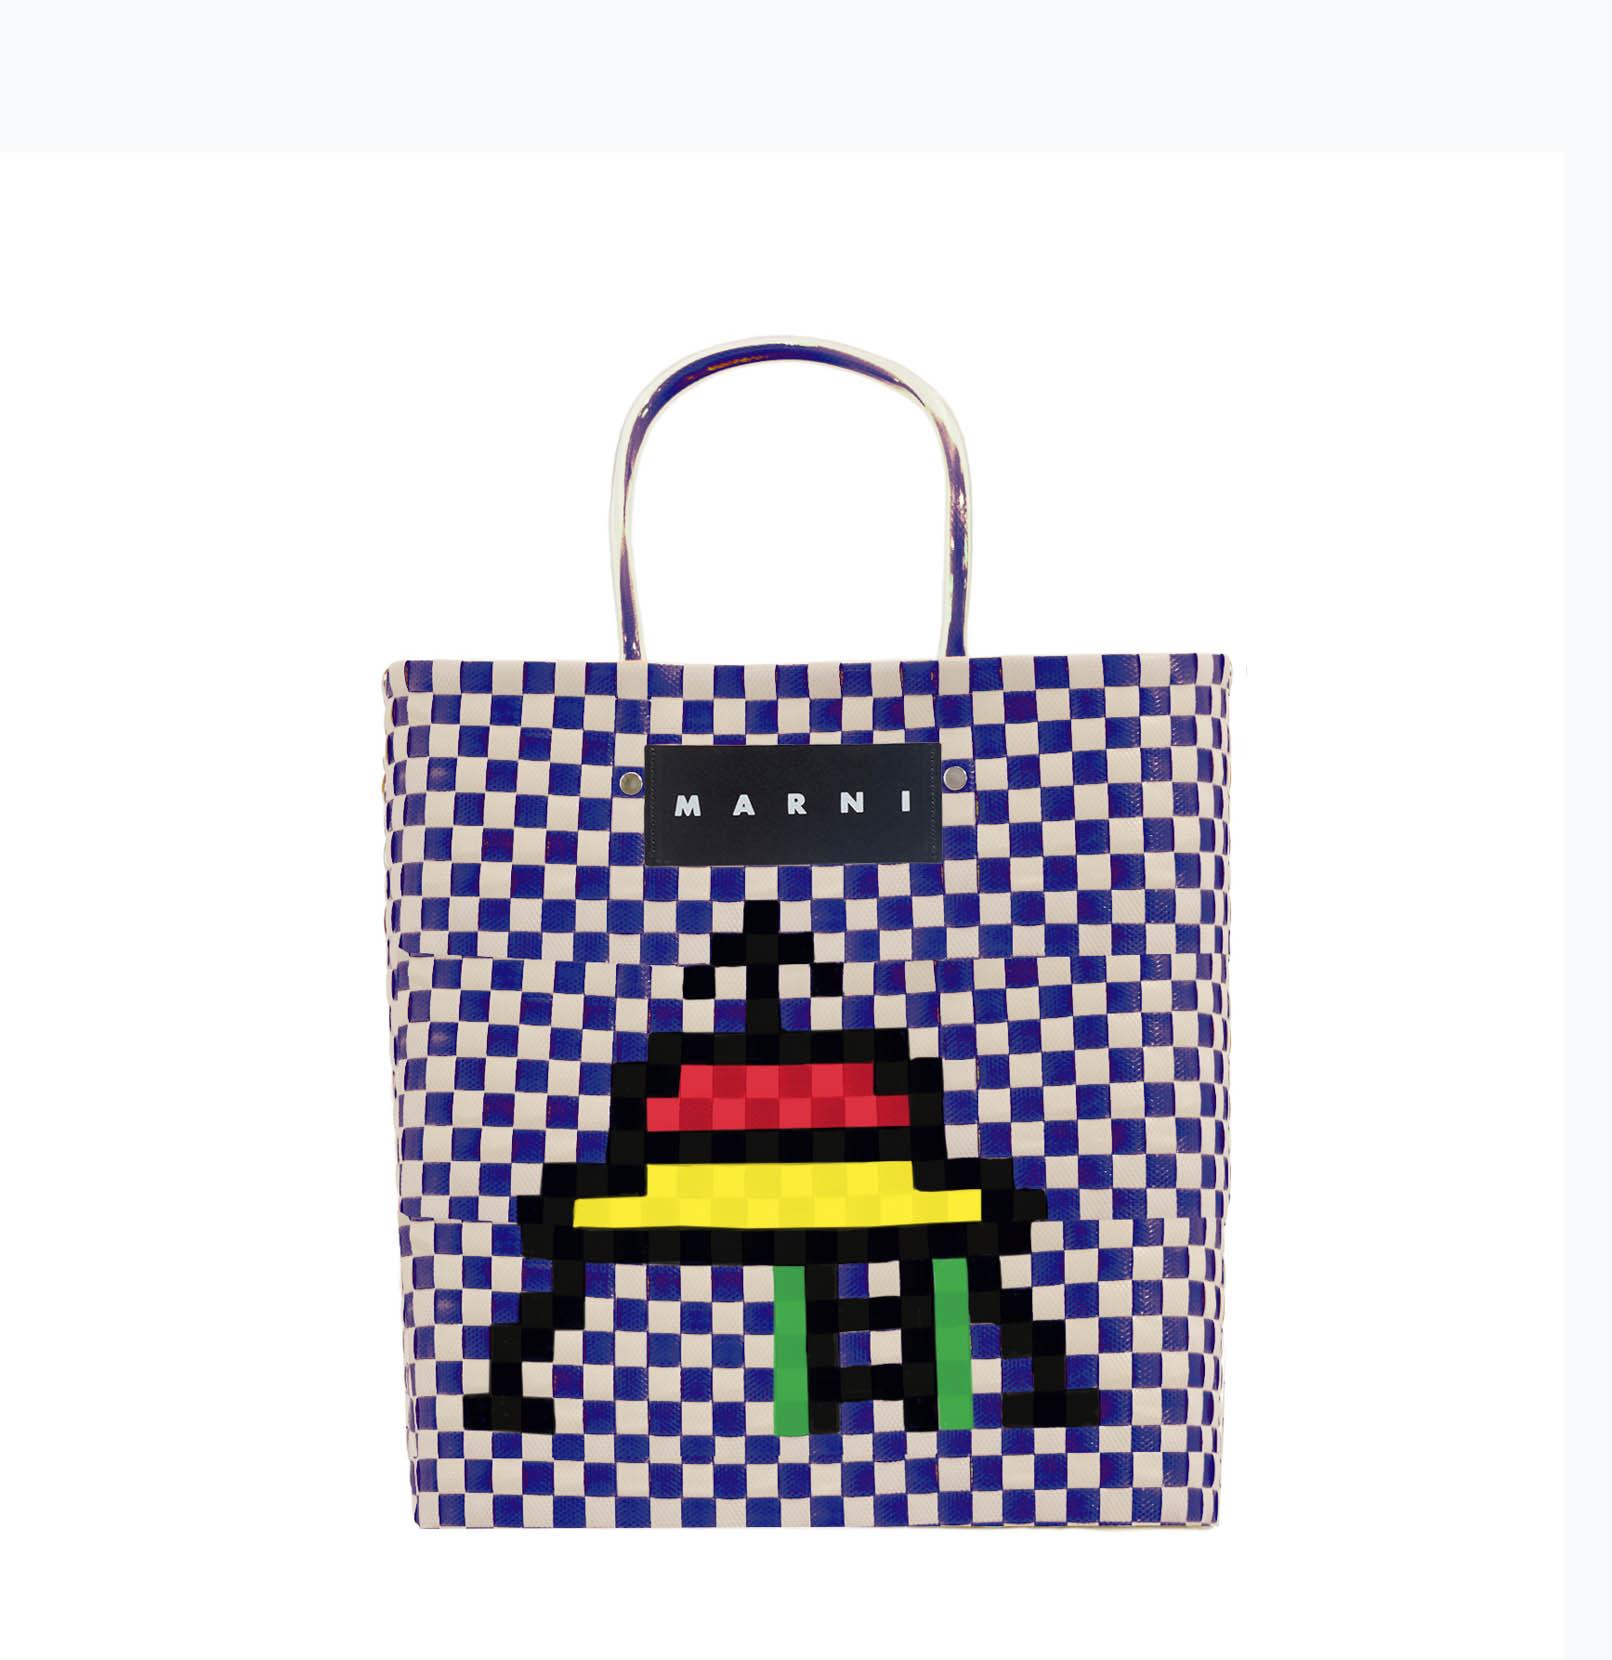 de125d333991 マルニが「マルニ マーケット」開催、人気のピクニックバッグや限定商品 ...